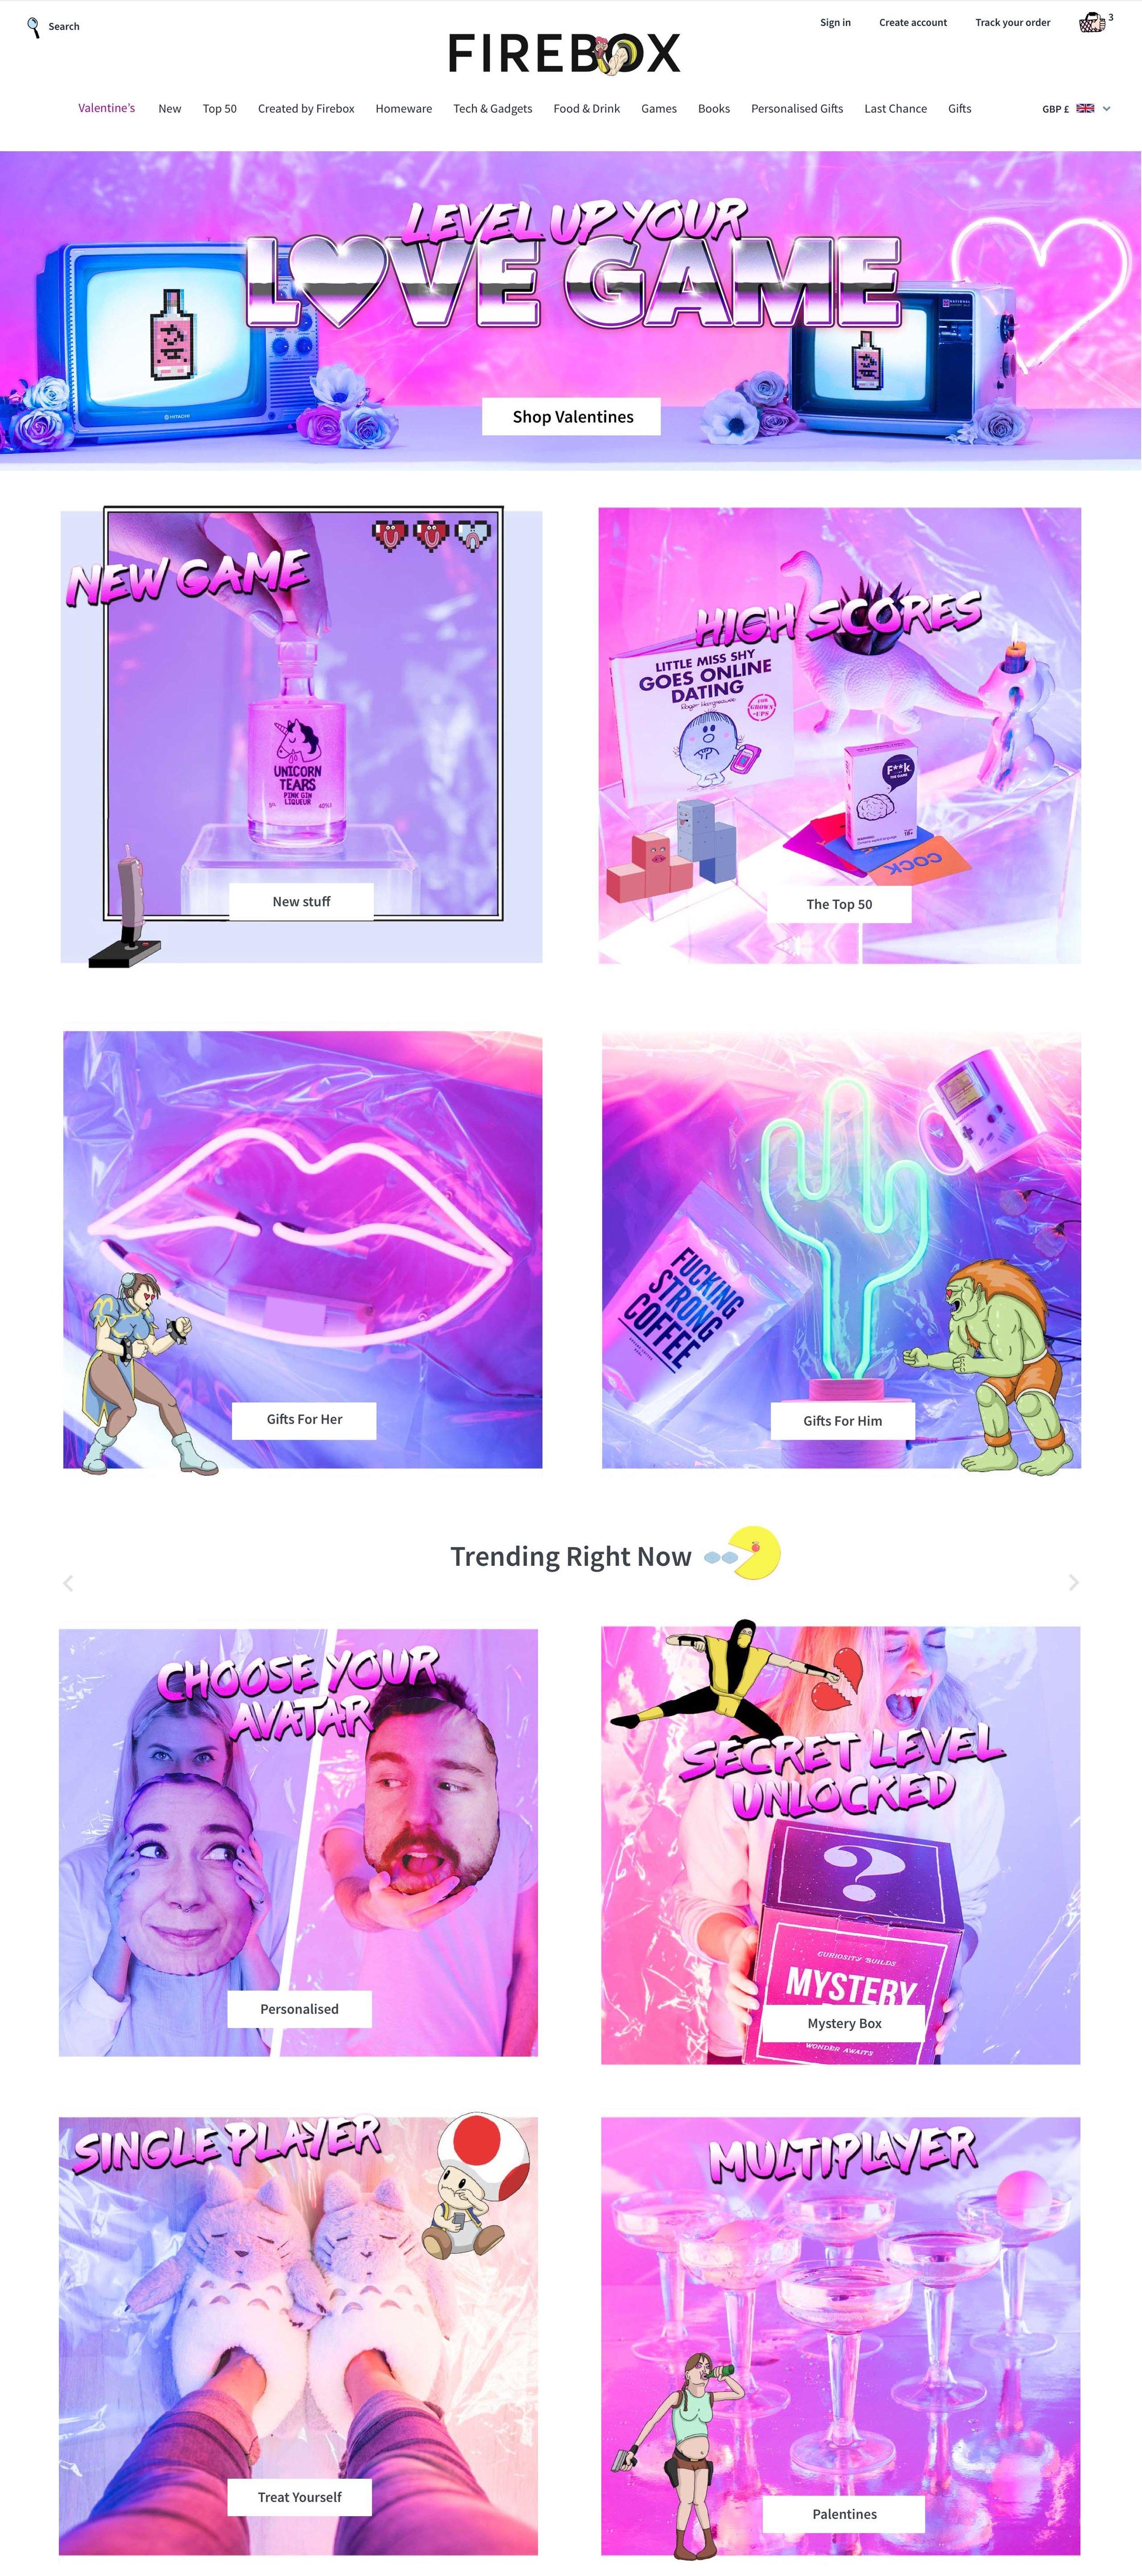 firebox_valentines_coloured lighting gels neon arcade 80s campaign